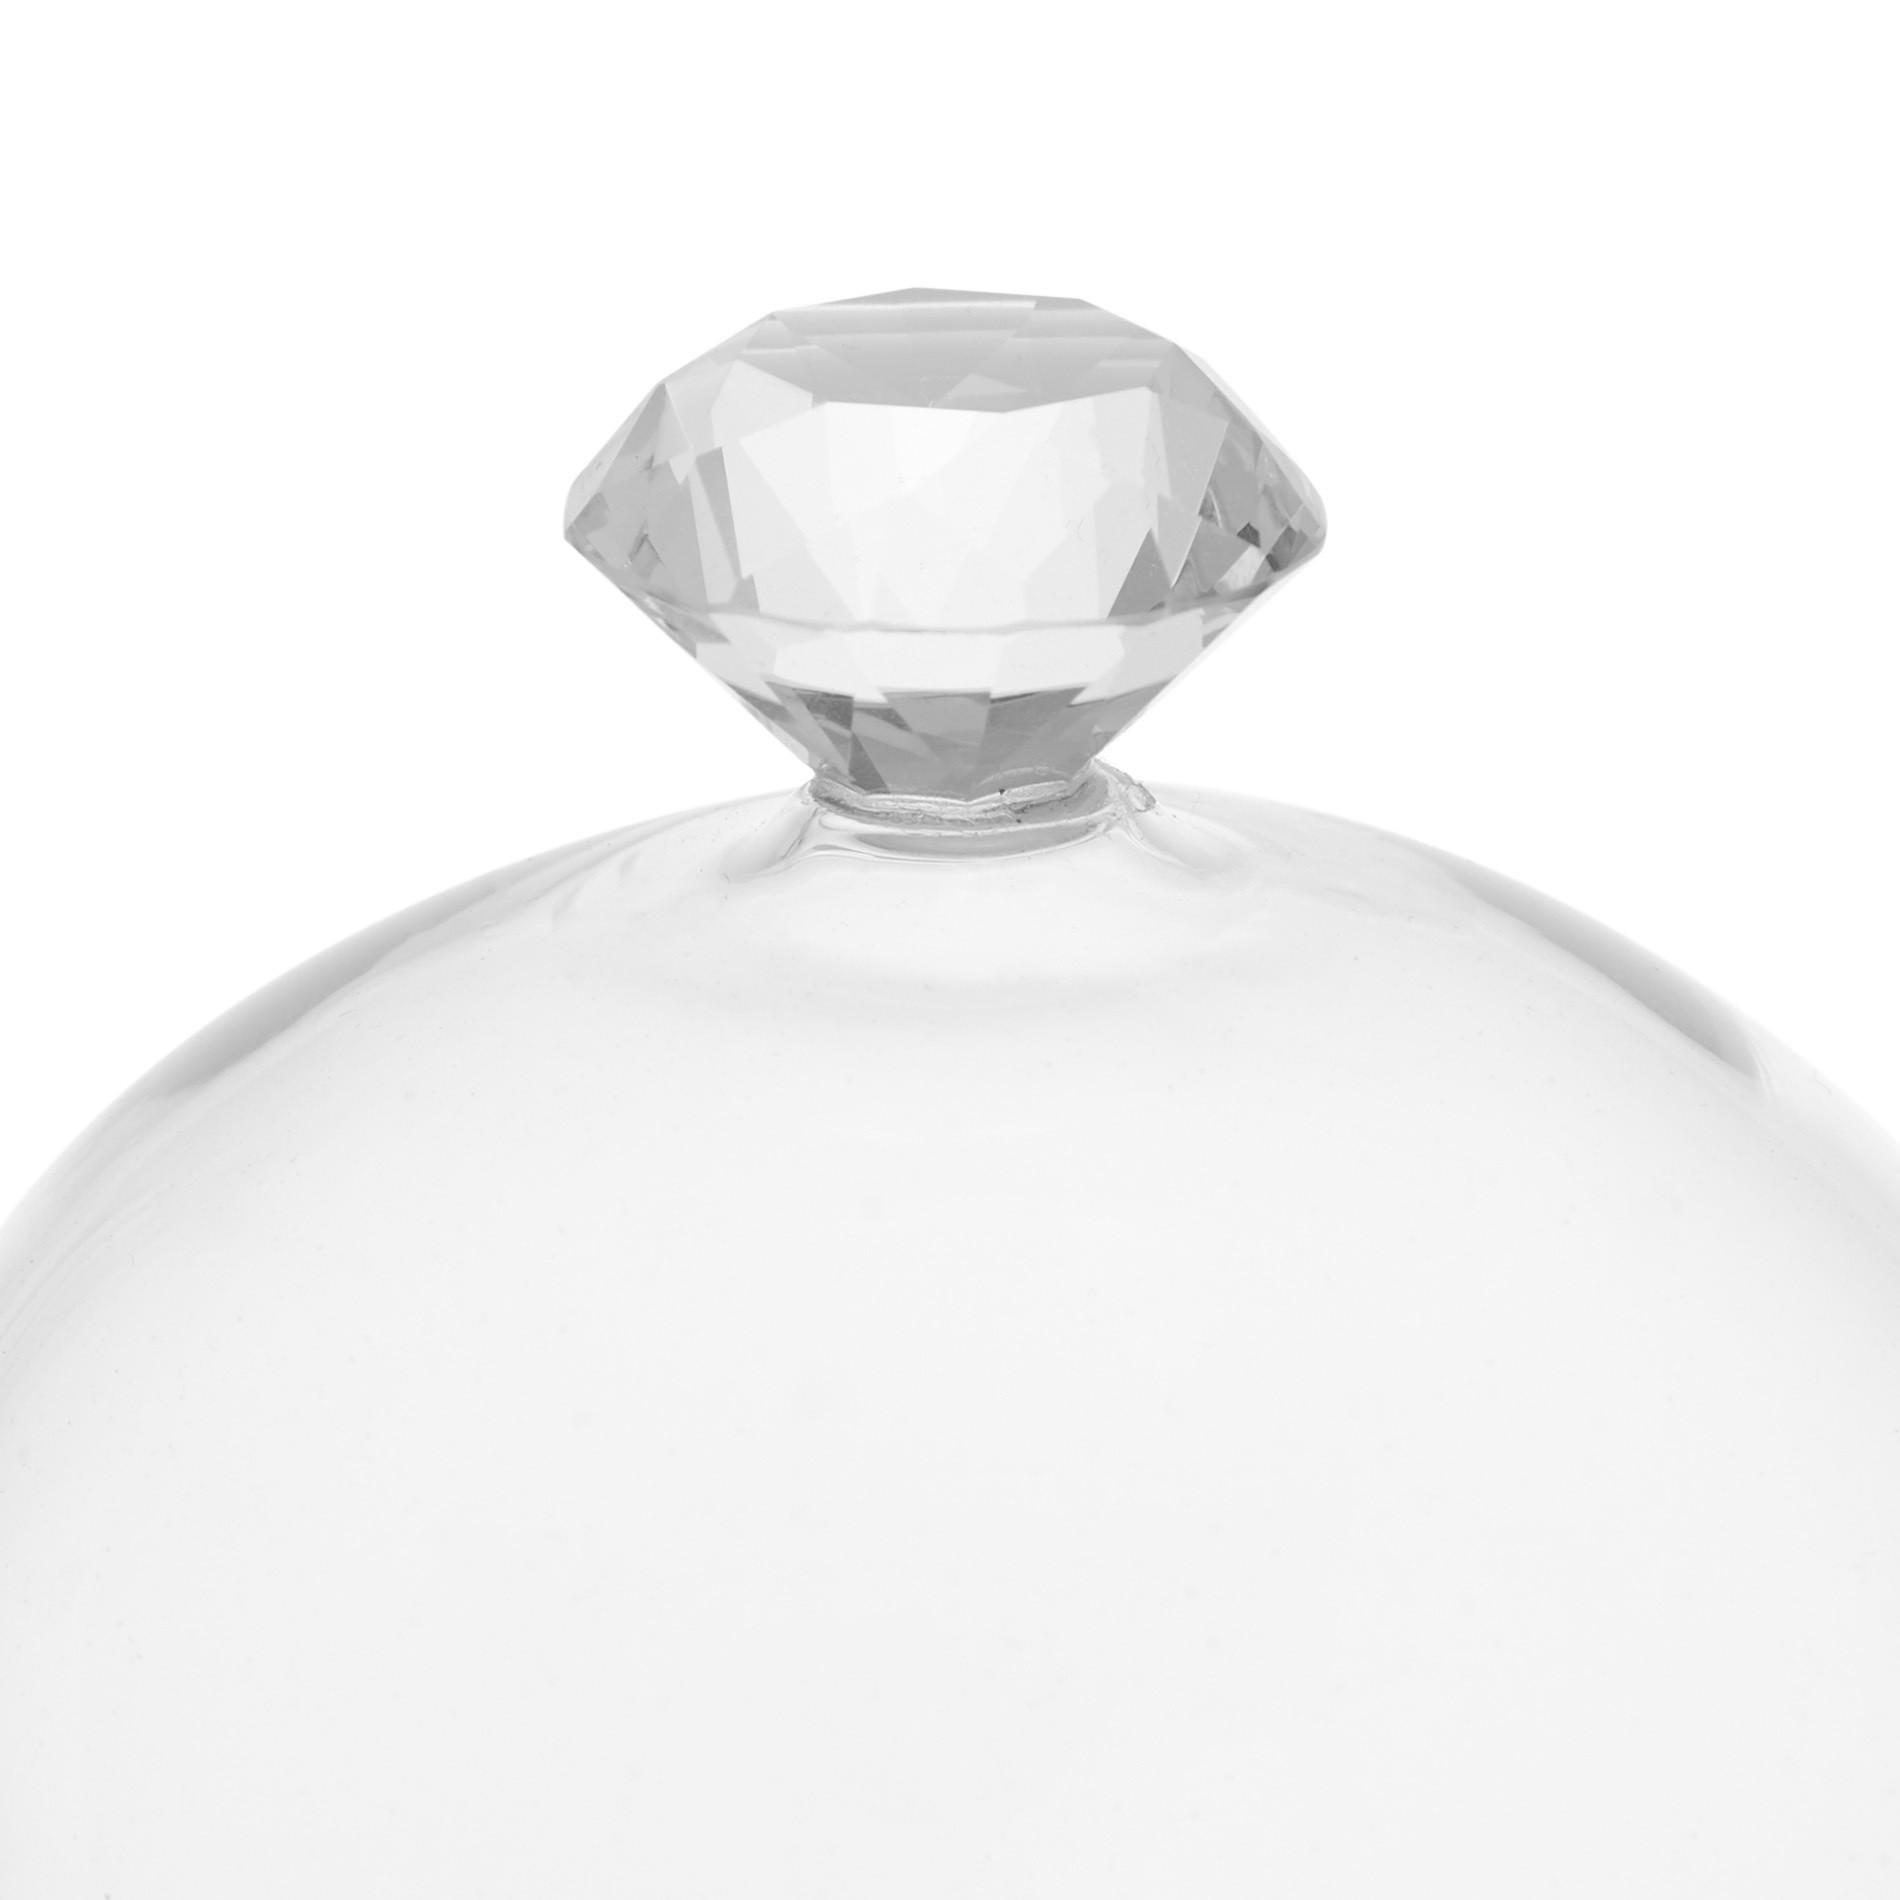 Alzata vetro con diamante, Bianco, large image number 2